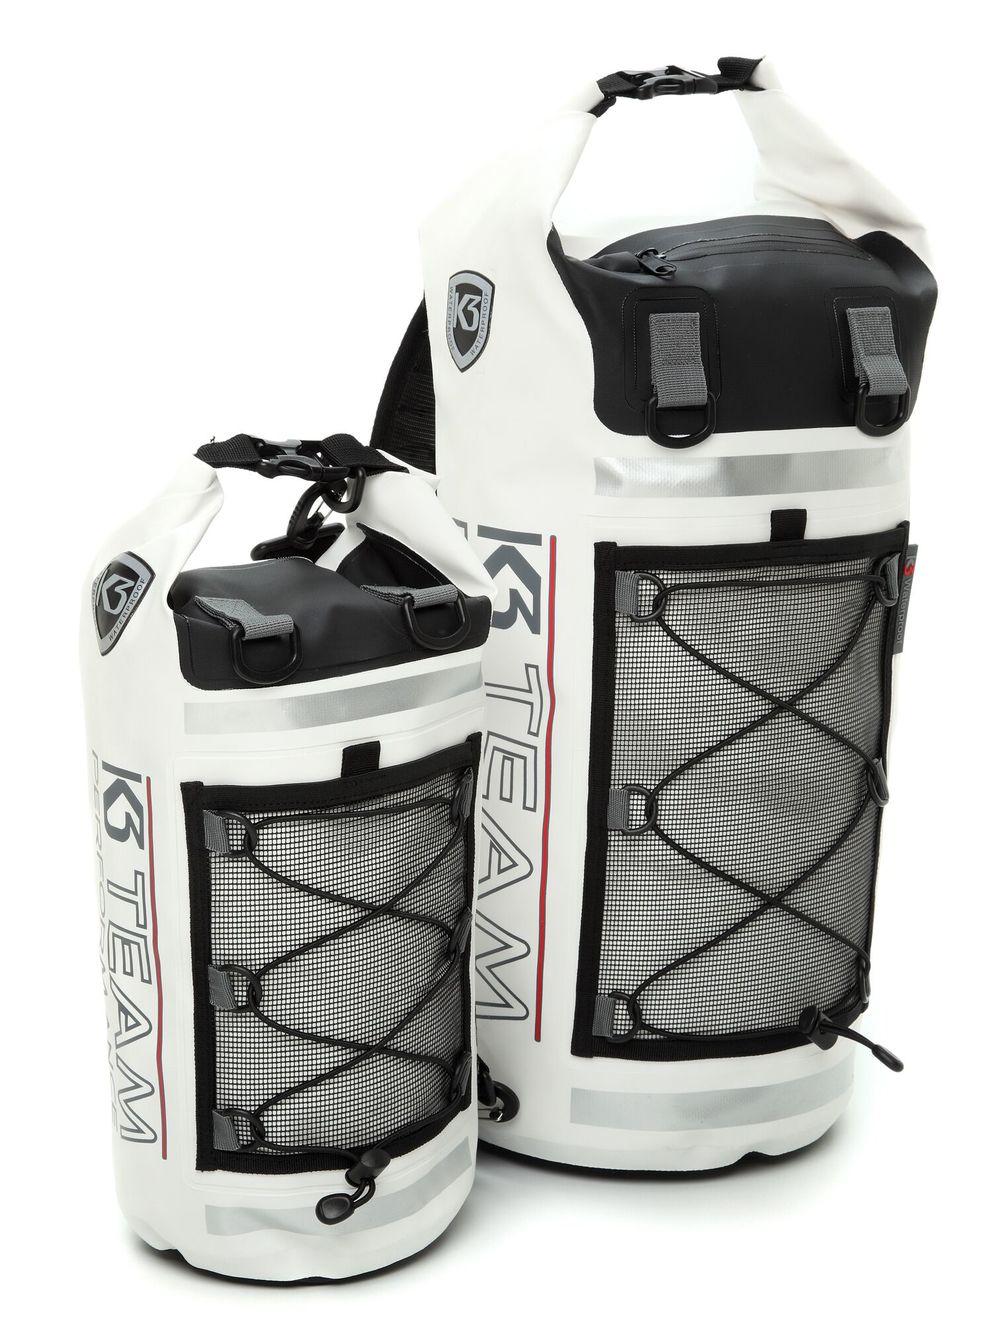 215cc2a89229 K3 Team Perf White .jpg. K3 Team Performance Pro-Tech Dry Tube. 55.00. K3  Dry Bag ...